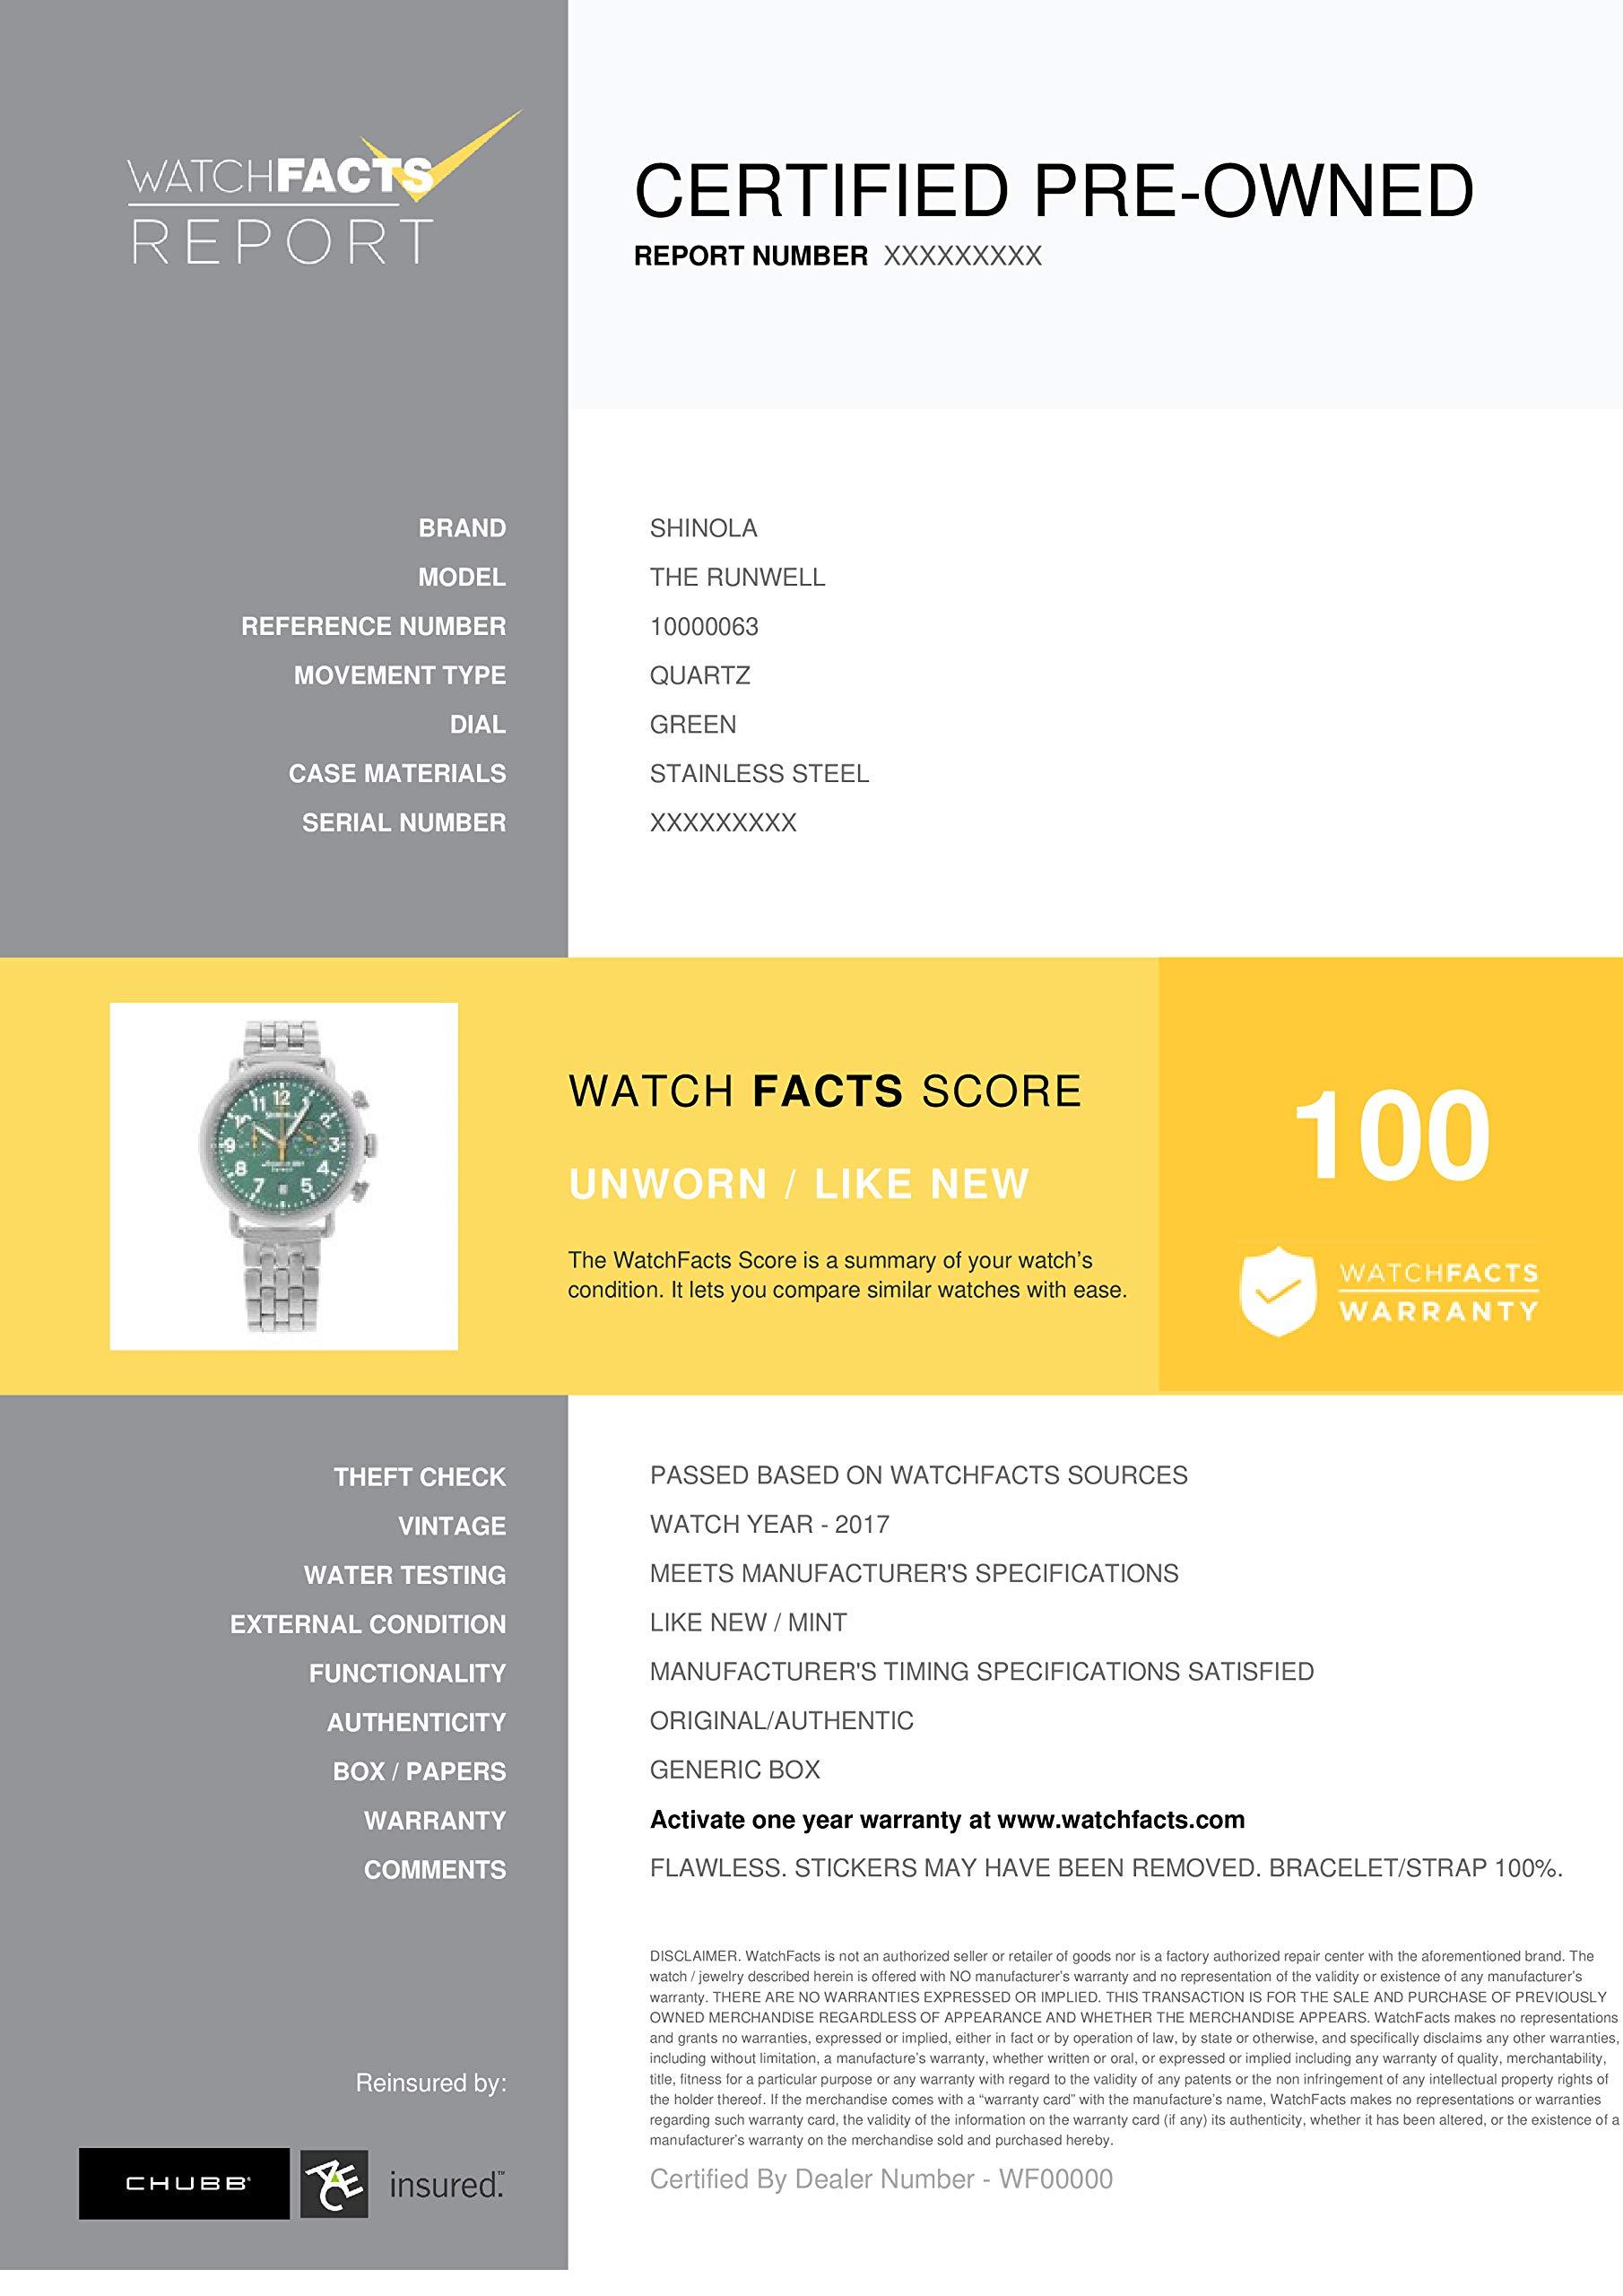 Shinola The Runwell Quartz Male Watch 10000063 (Certified Pre-Owned) by Shinola (Image #6)